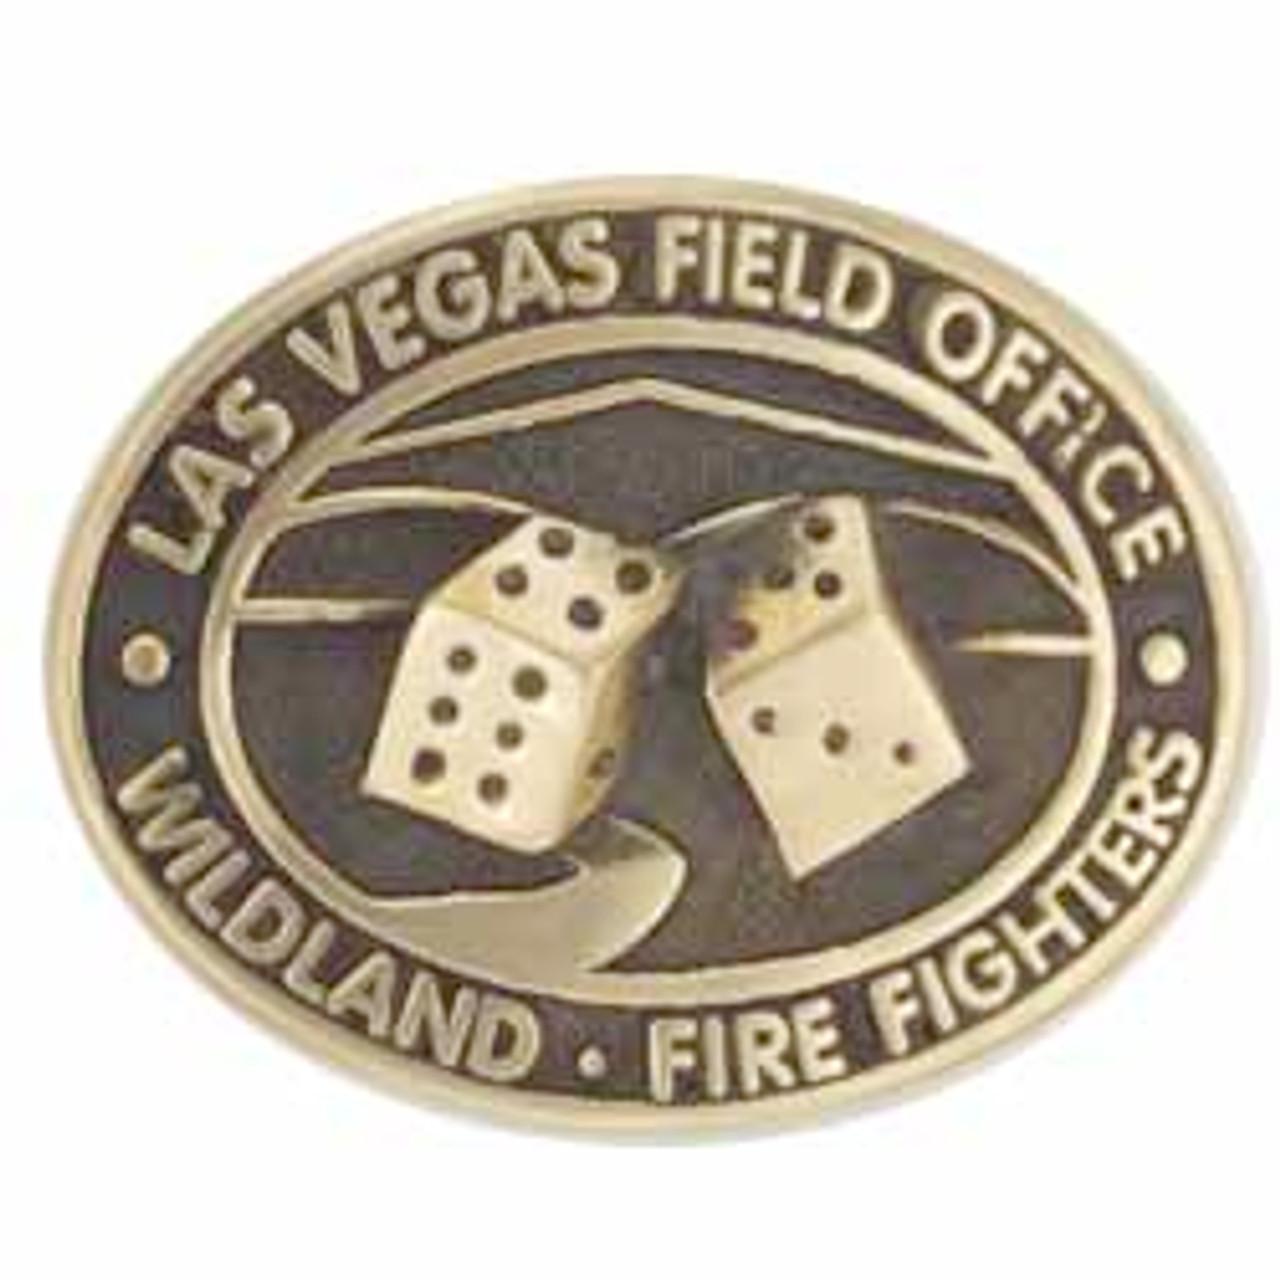 Las Vegas Field Office Wildland Fire Fighters BLM Buckle (RESTRICTED)